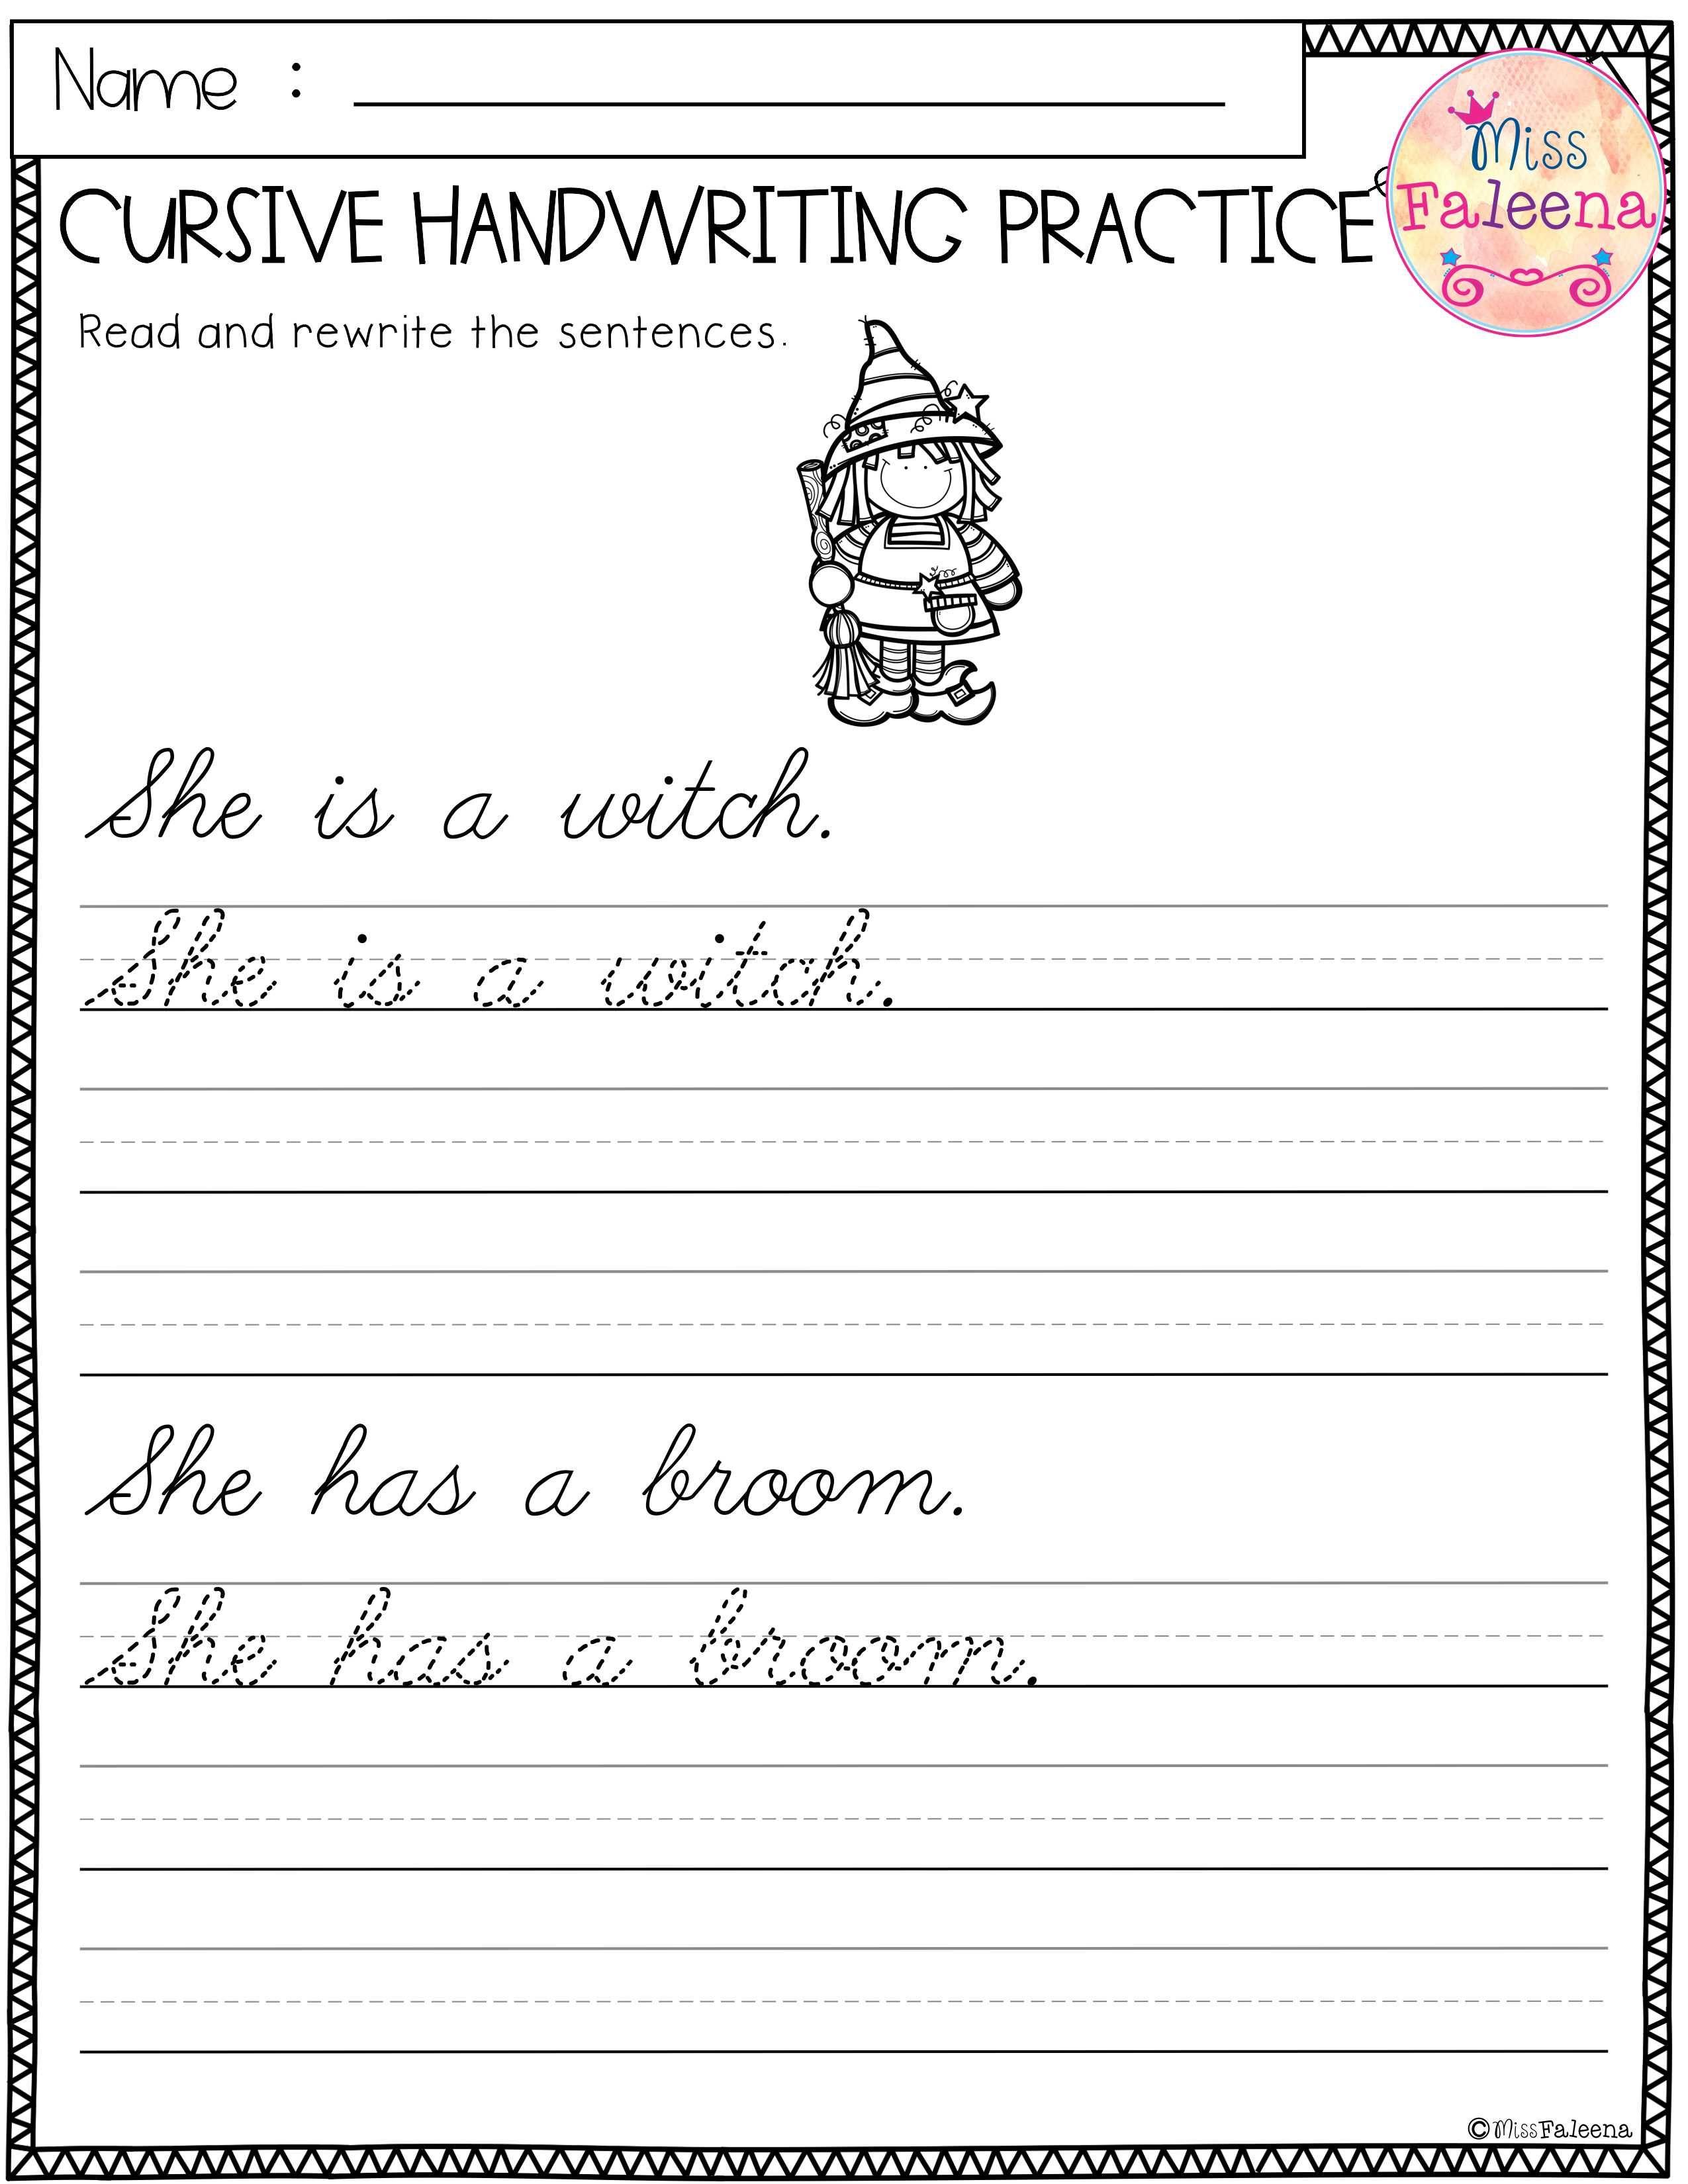 Halloween Cursive Handwriting This Product Has 20 Pages Of Handwriting Works Cursive Handwriting Practice Cursive Writing Worksheets Teaching Cursive Writing [ 3300 x 2550 Pixel ]